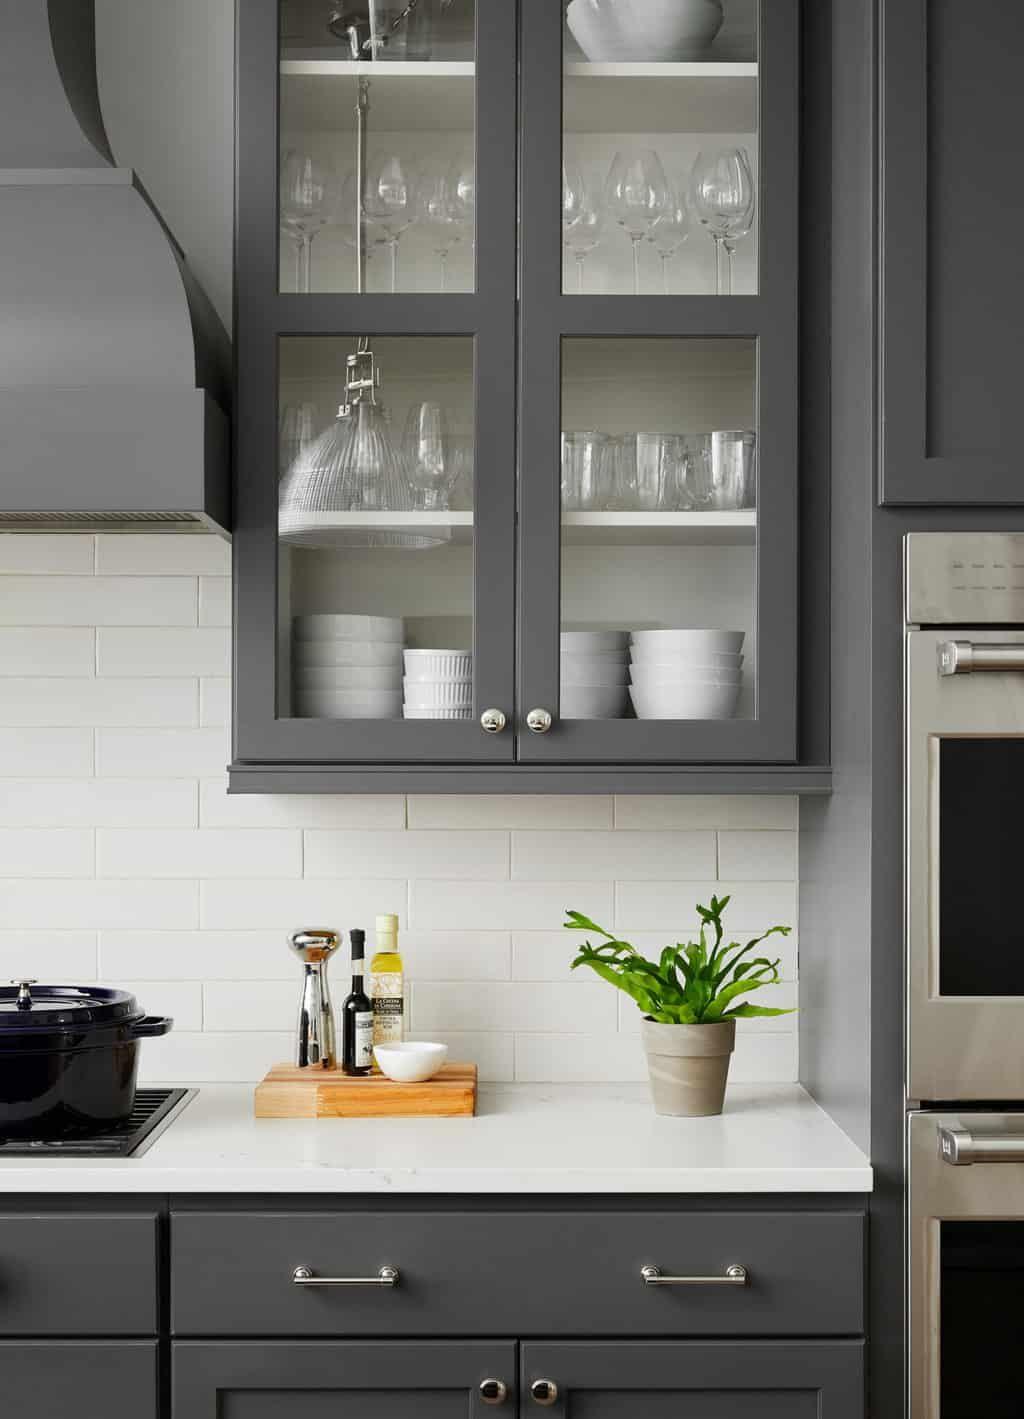 Dark Gray Kitchen Cabinets Trending For 2020 In 2020 Dark Grey